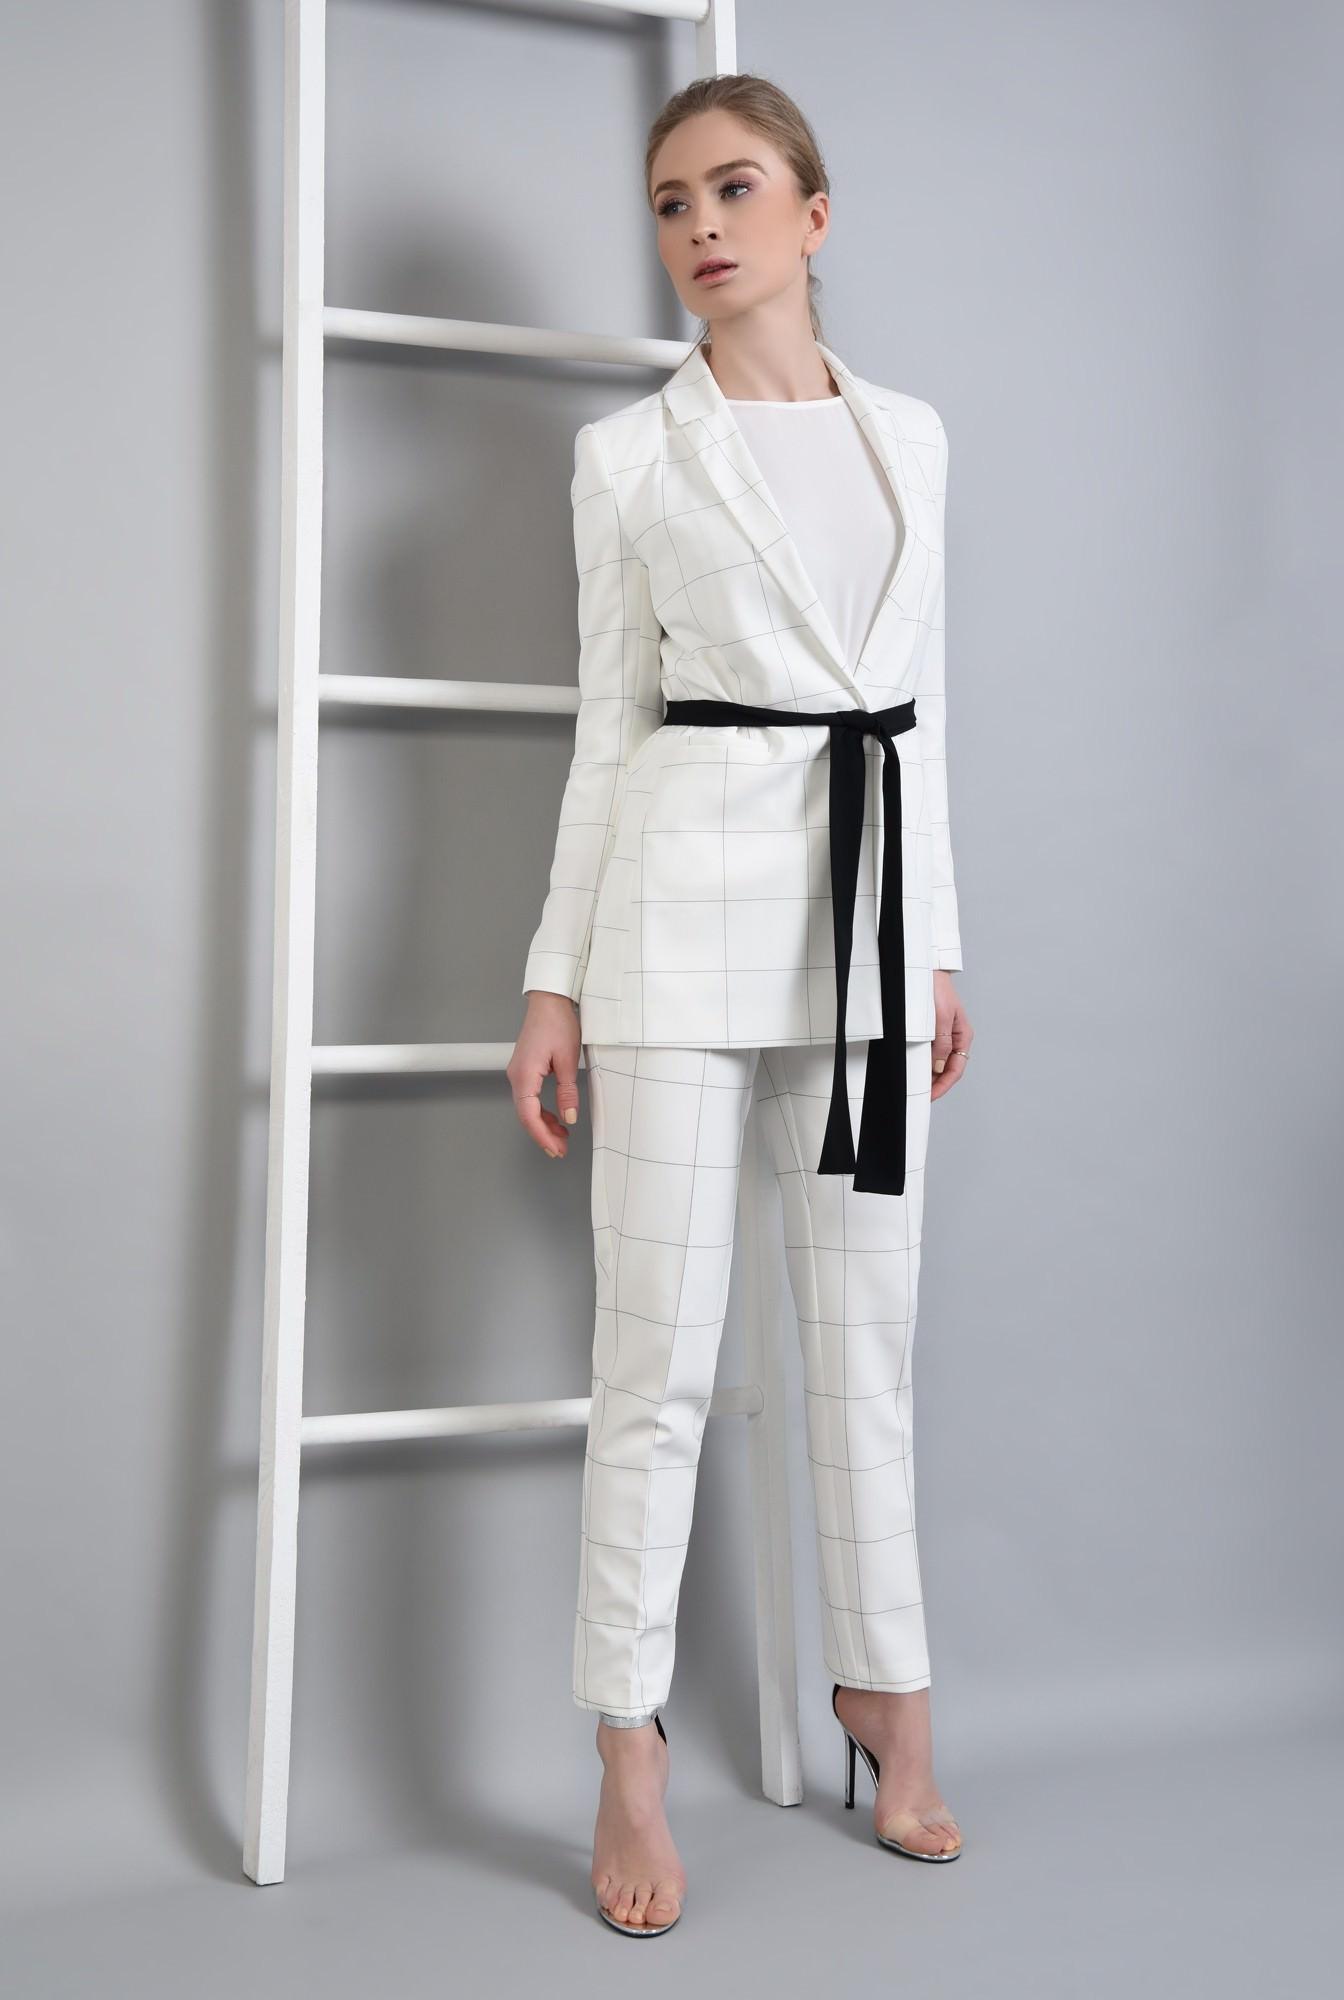 3 - Sacou elegant, alb